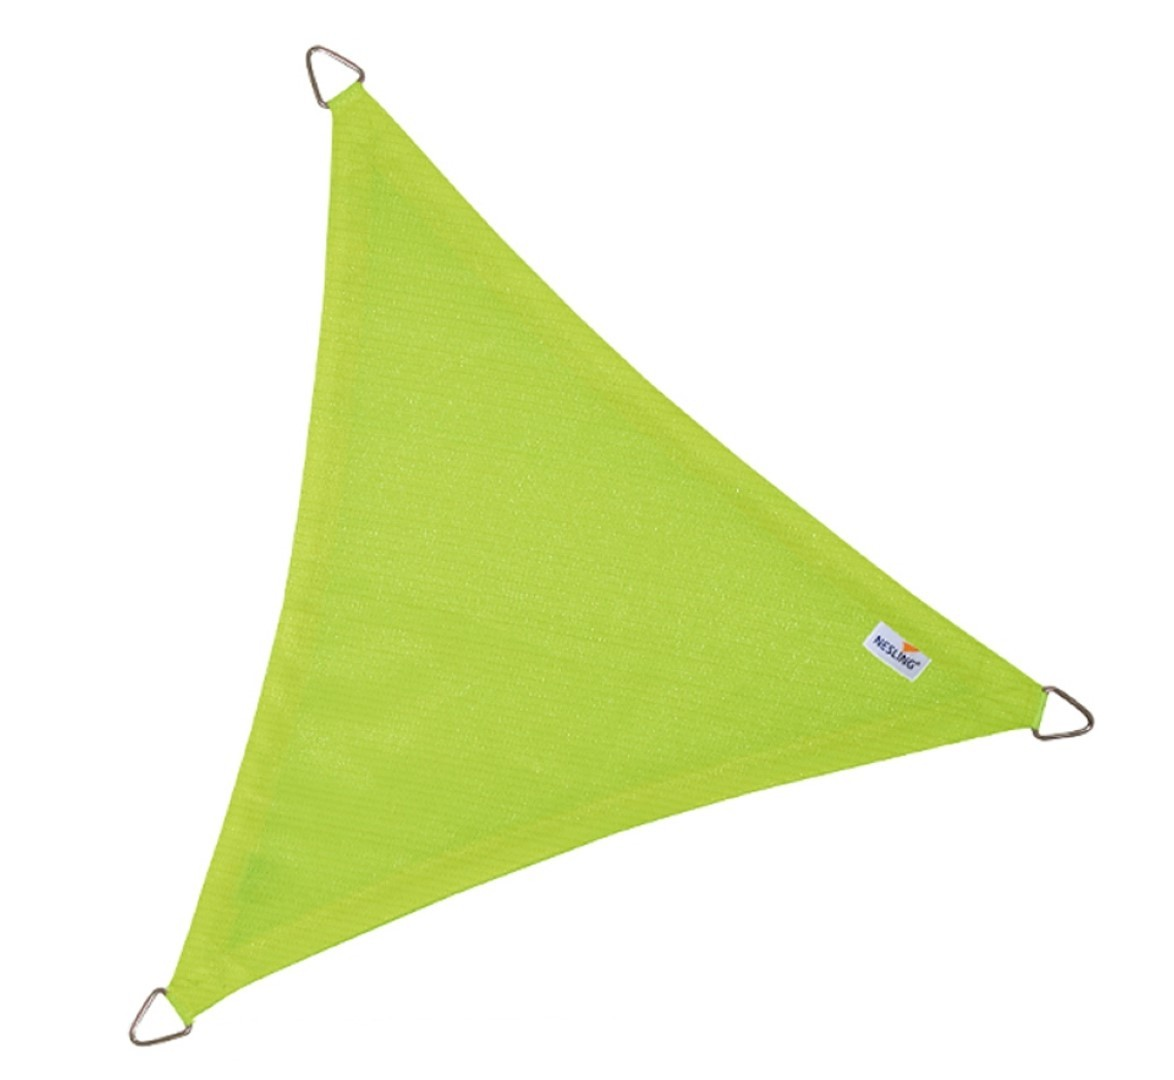 Driehoek 5,0 x 5,0 x 5,0m, Lime Groen